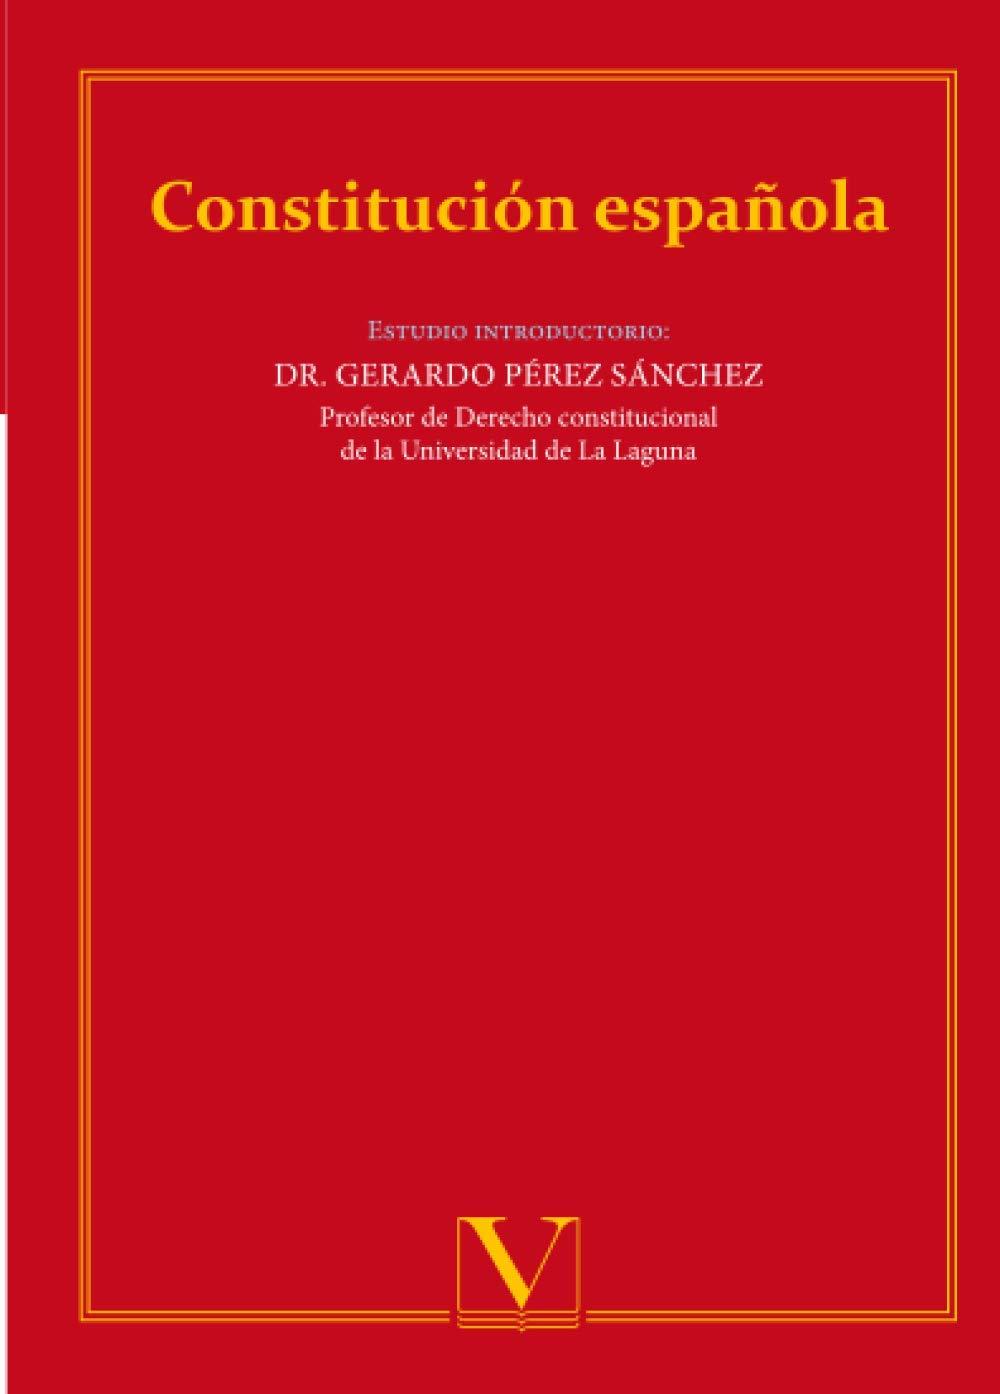 Constitución Española (Ensayo): Amazon.es: Pérez Sánchez, Gerardo: Libros